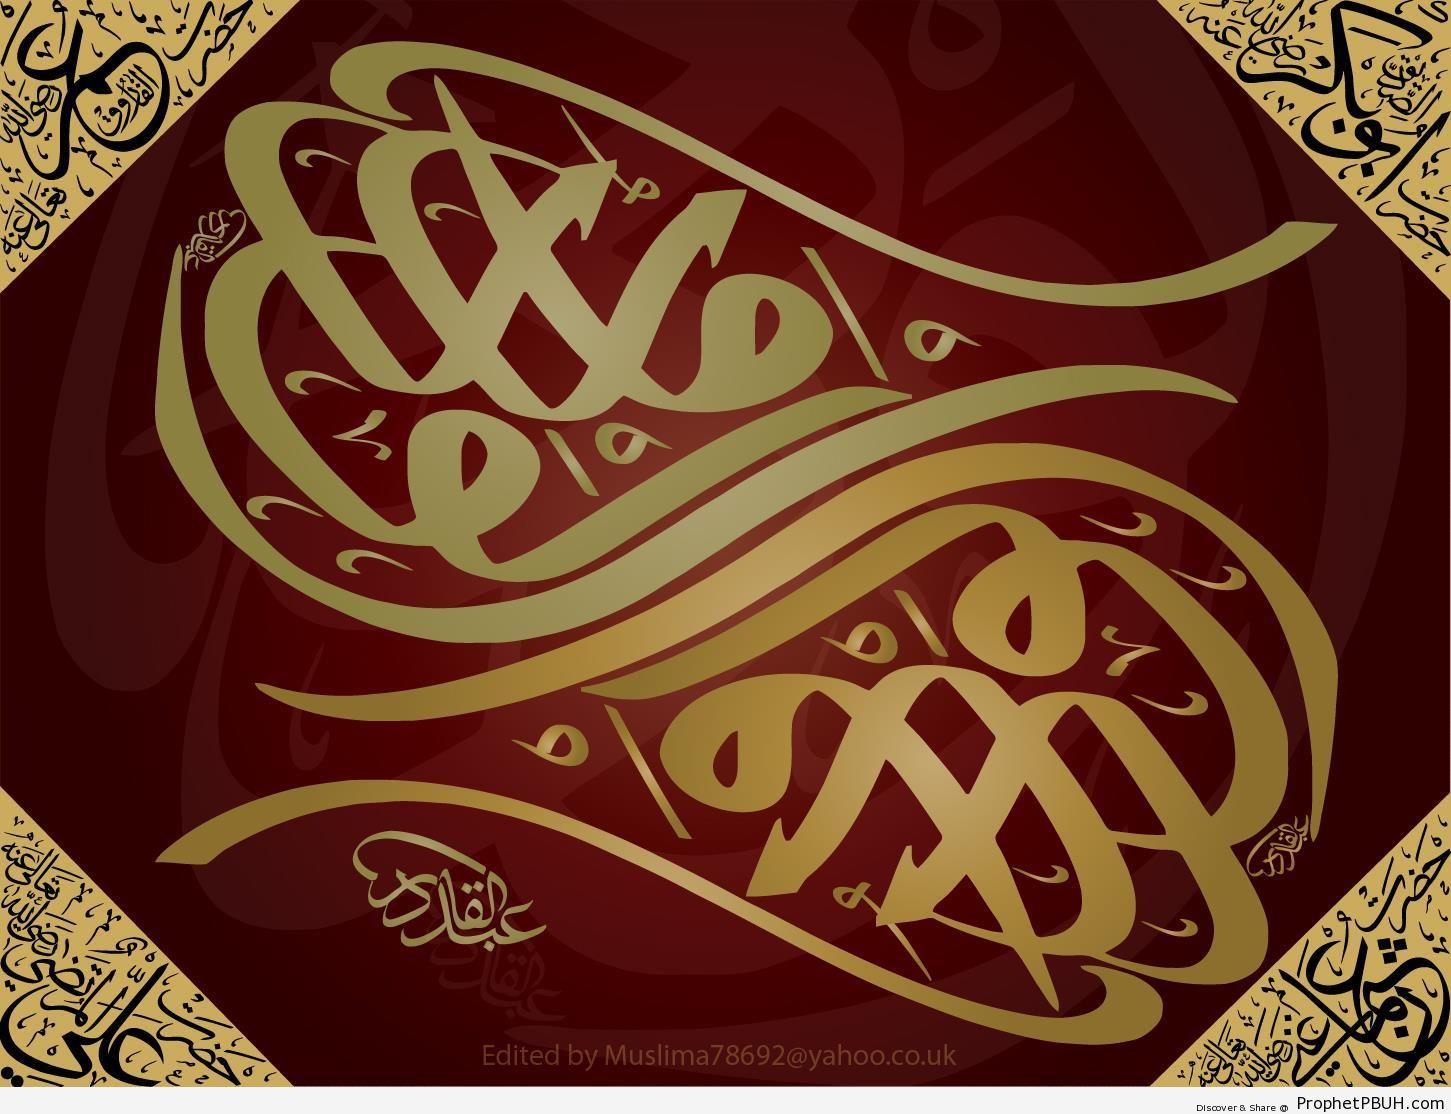 Al-Wadud Name of God Calligraphy and the Four Rashidun Caliphs - Al-Wadud (The Loving)